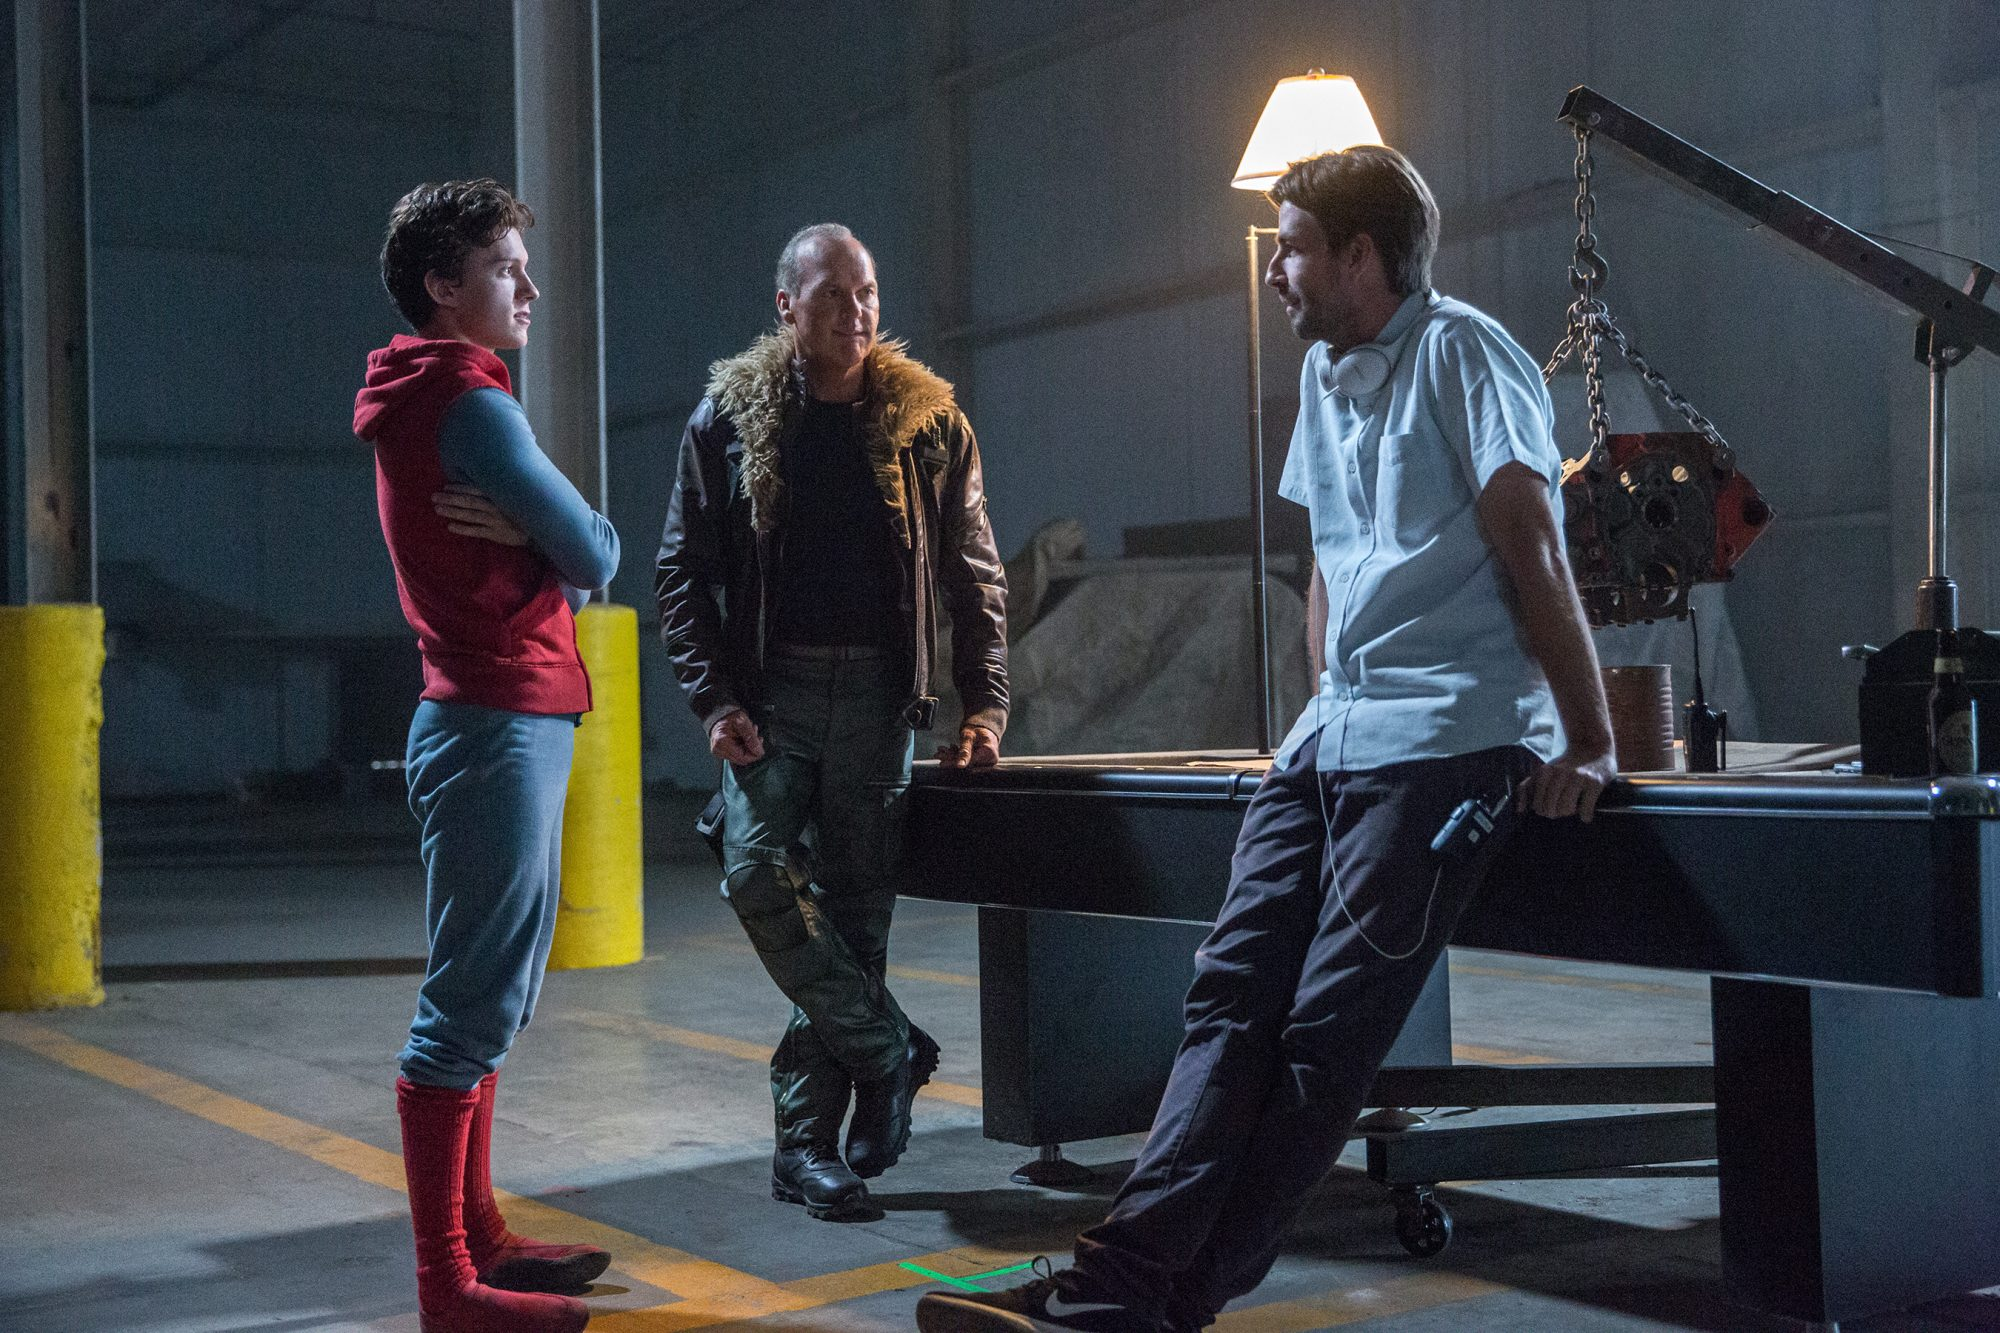 BTS;Crew;Jon Watts - (Director);Michael Keaton;Tom Holland